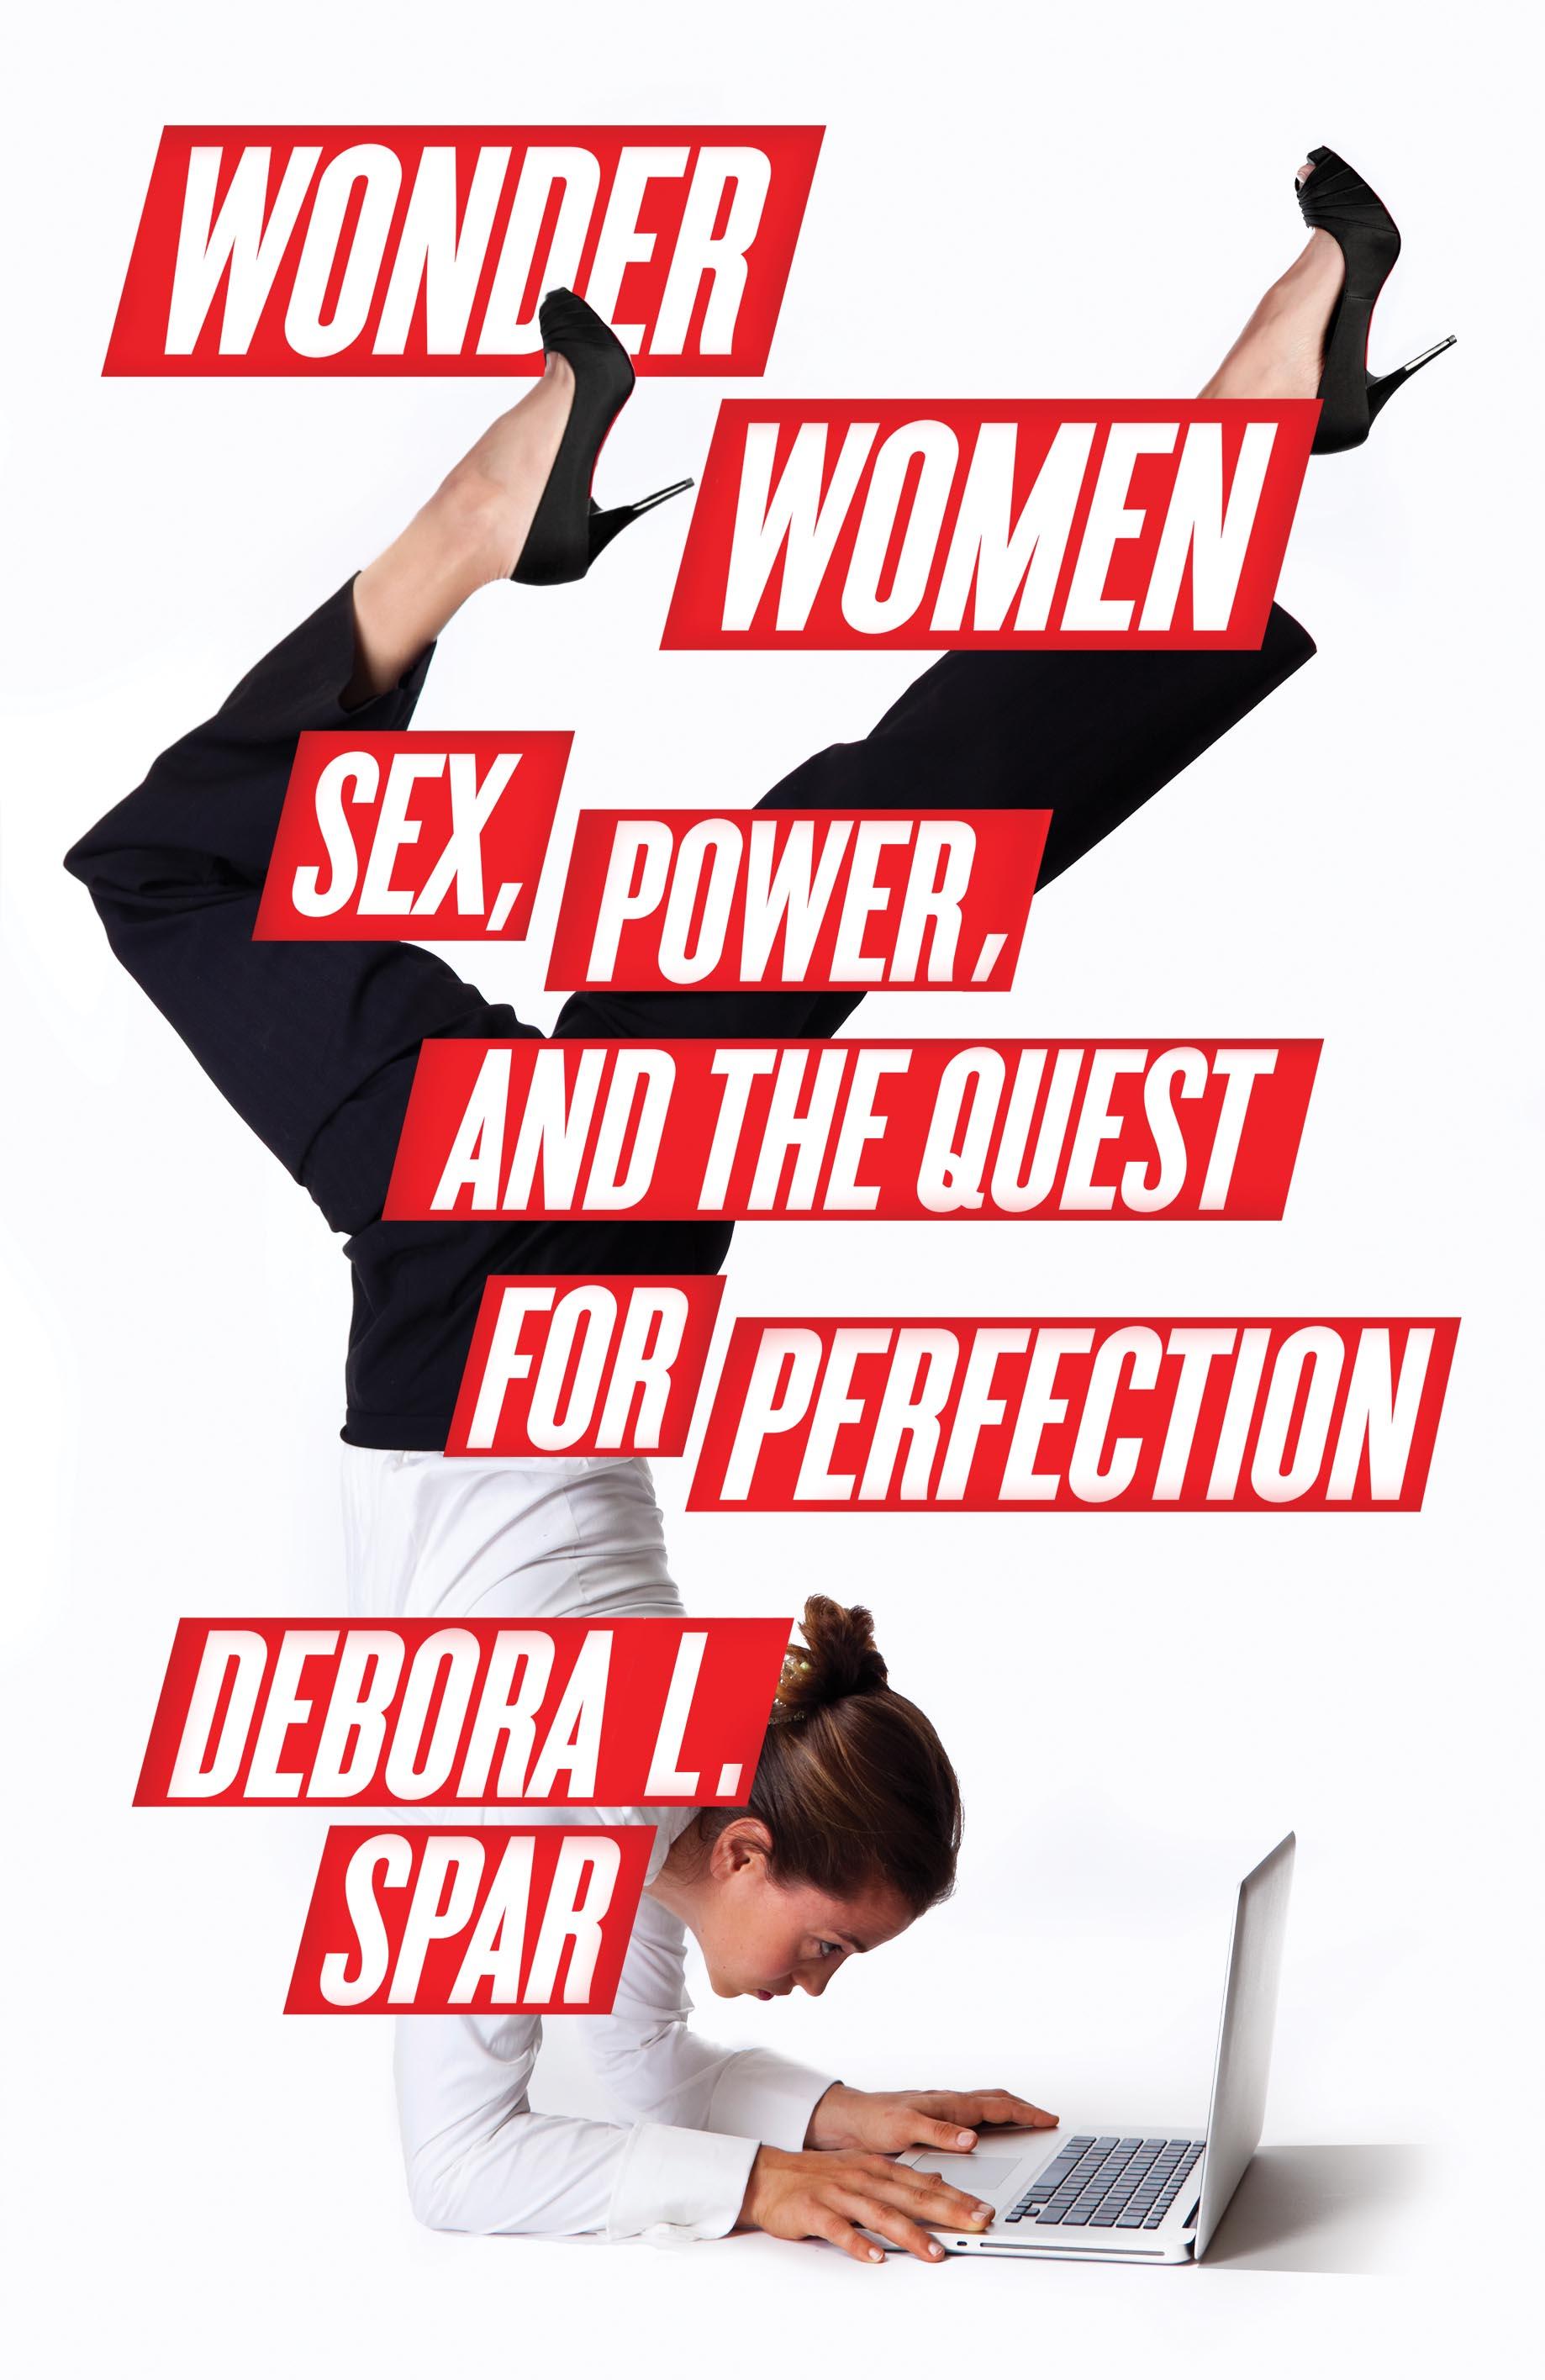 Sex is power woman